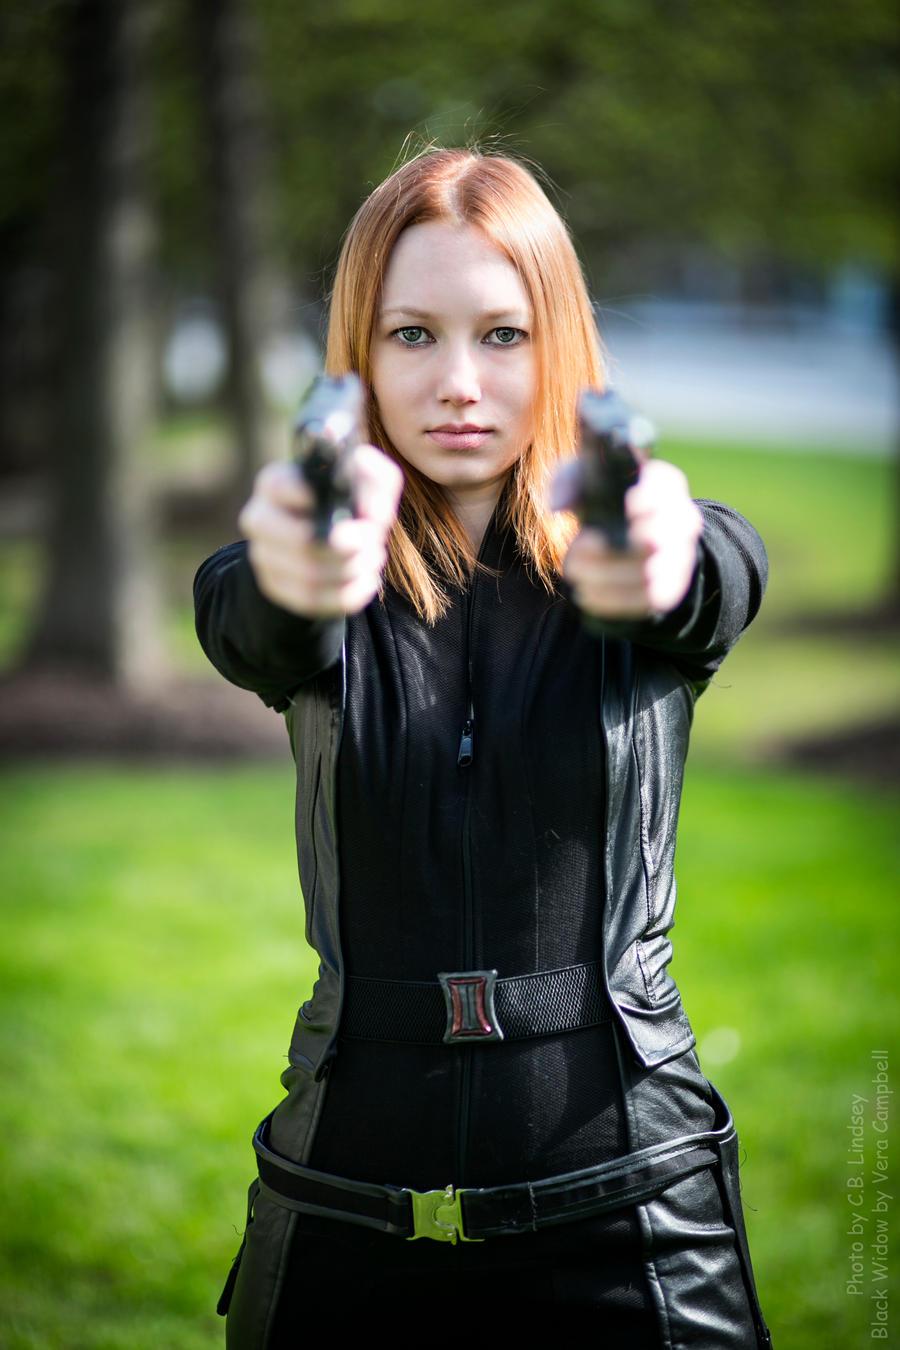 The Black Widow by Verdaera